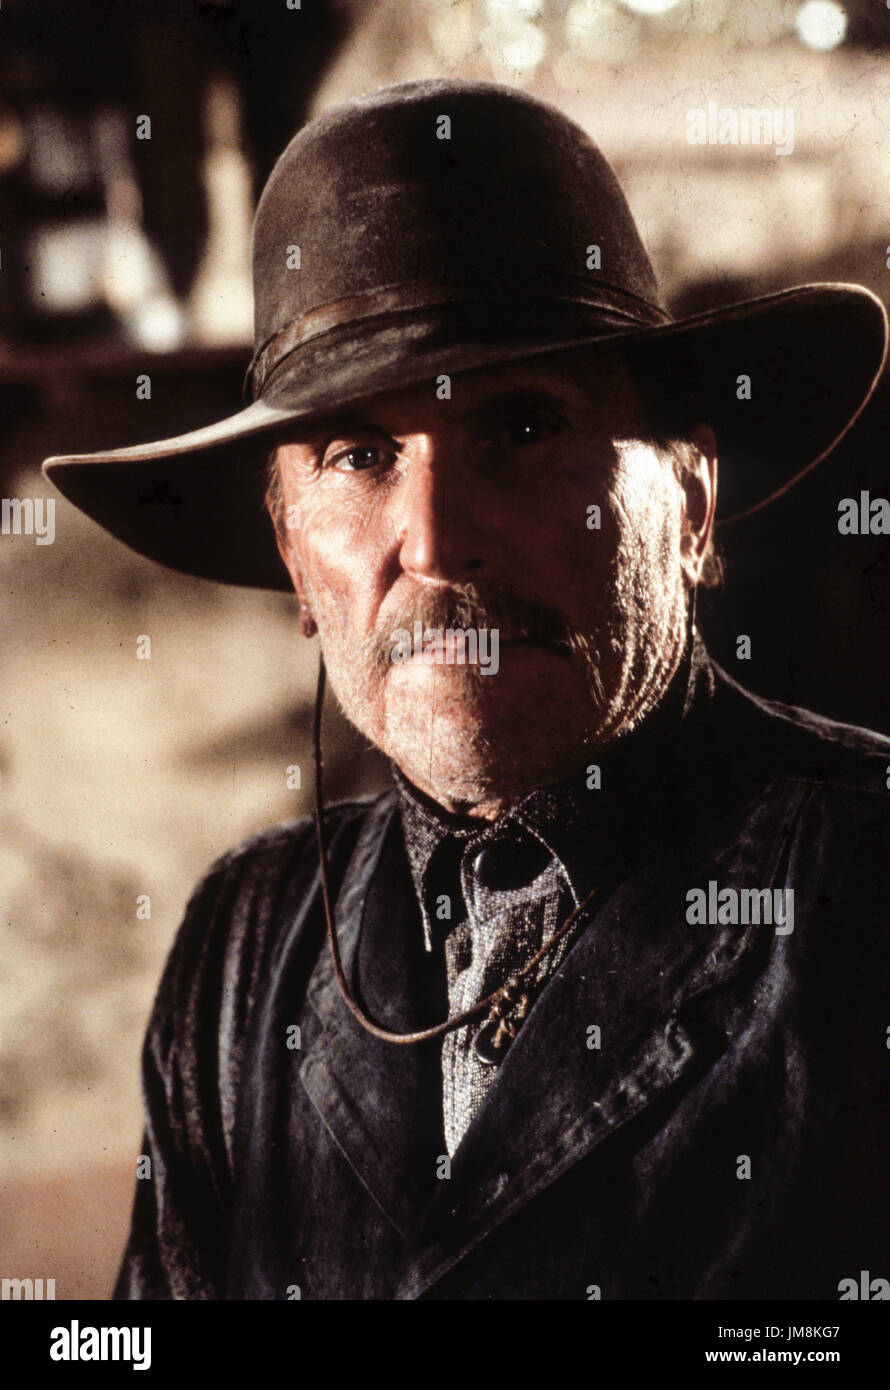 robert duvall, geronimo an american legend, 1993 - Stock Image